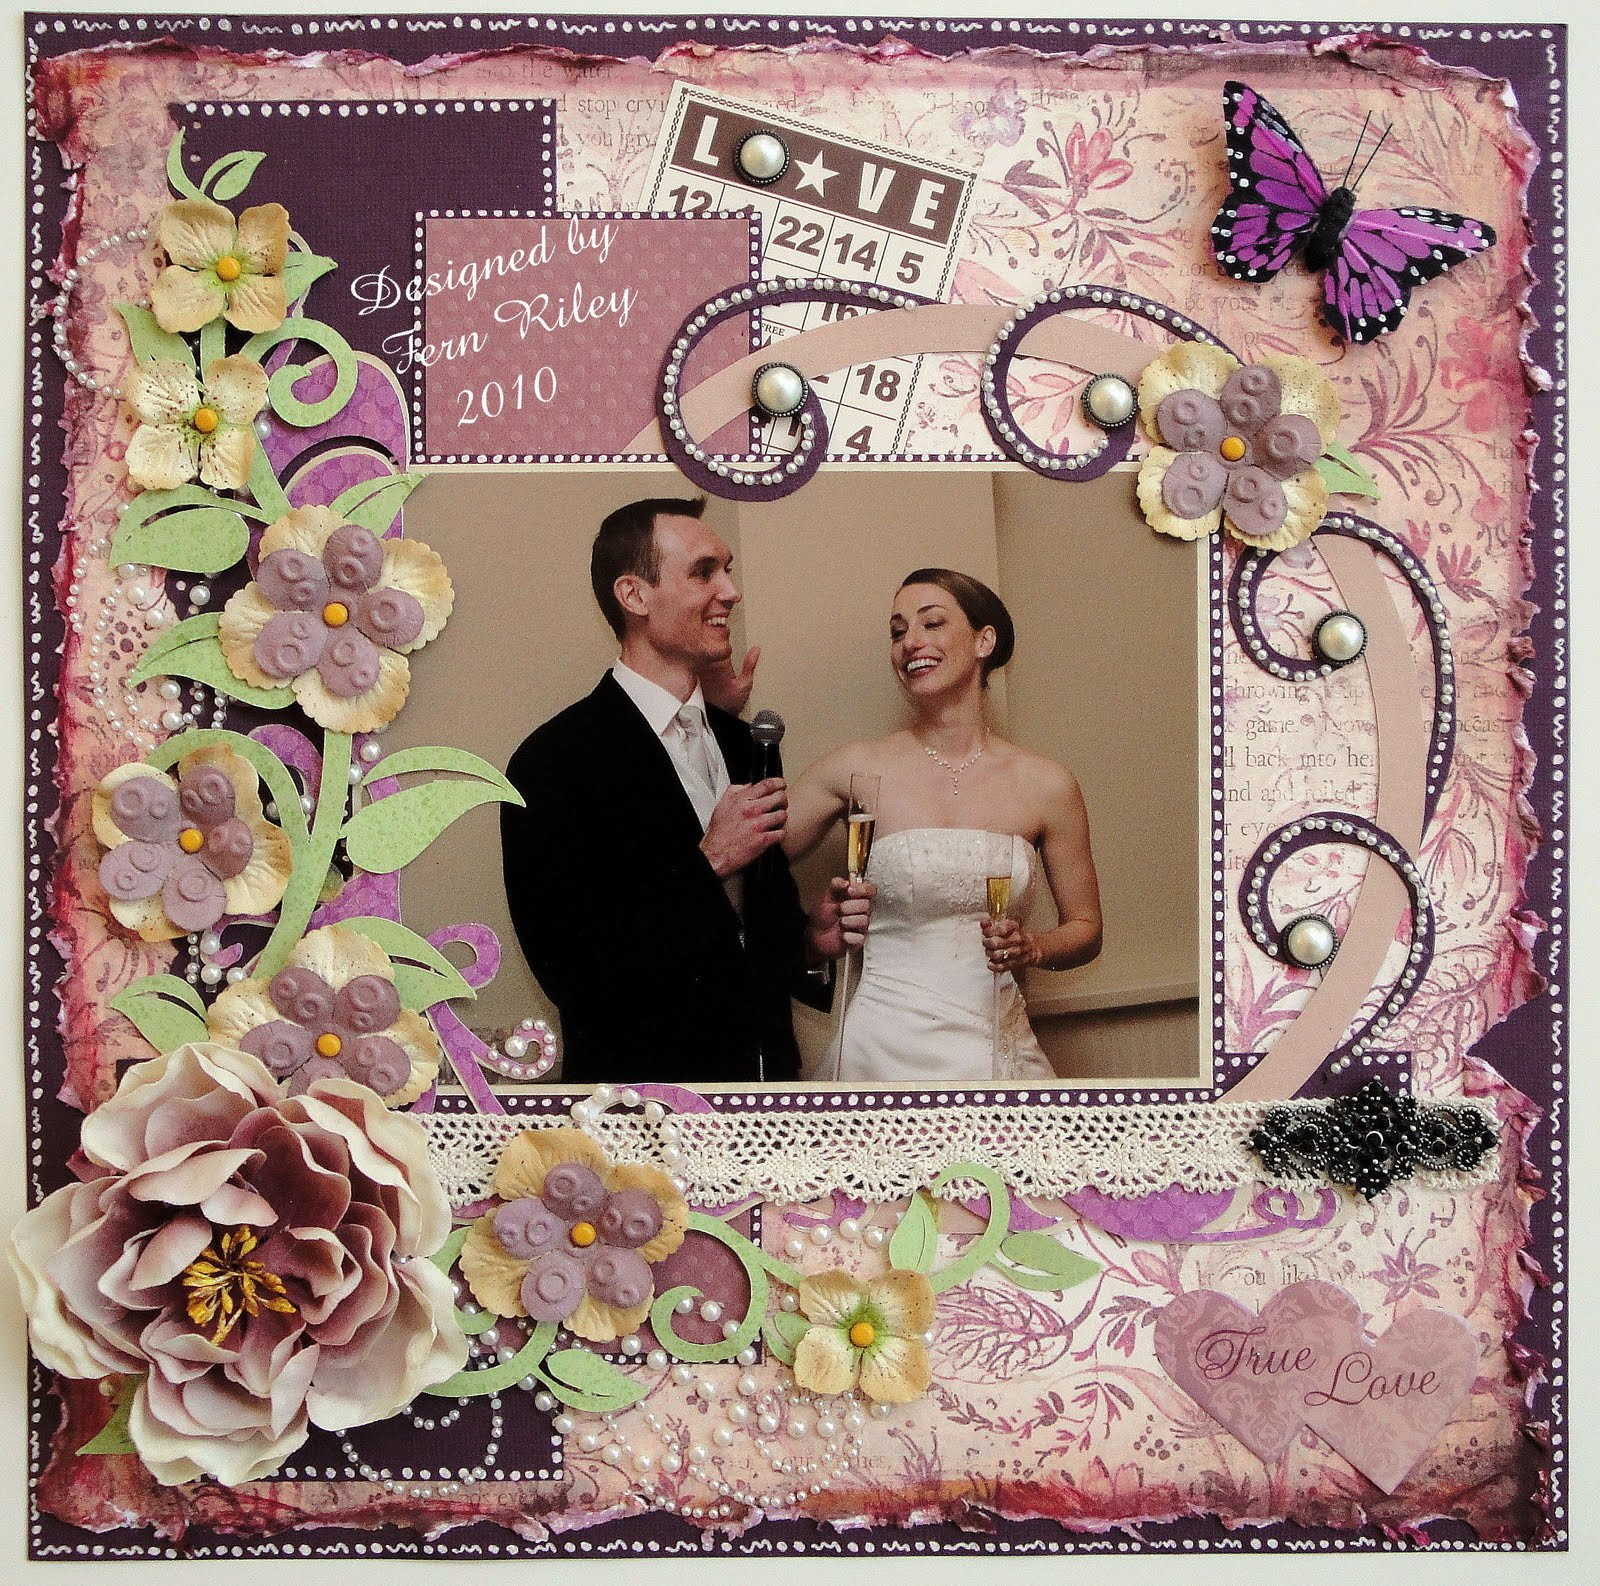 How to scrapbook wedding album - Amanda S Wedding Album